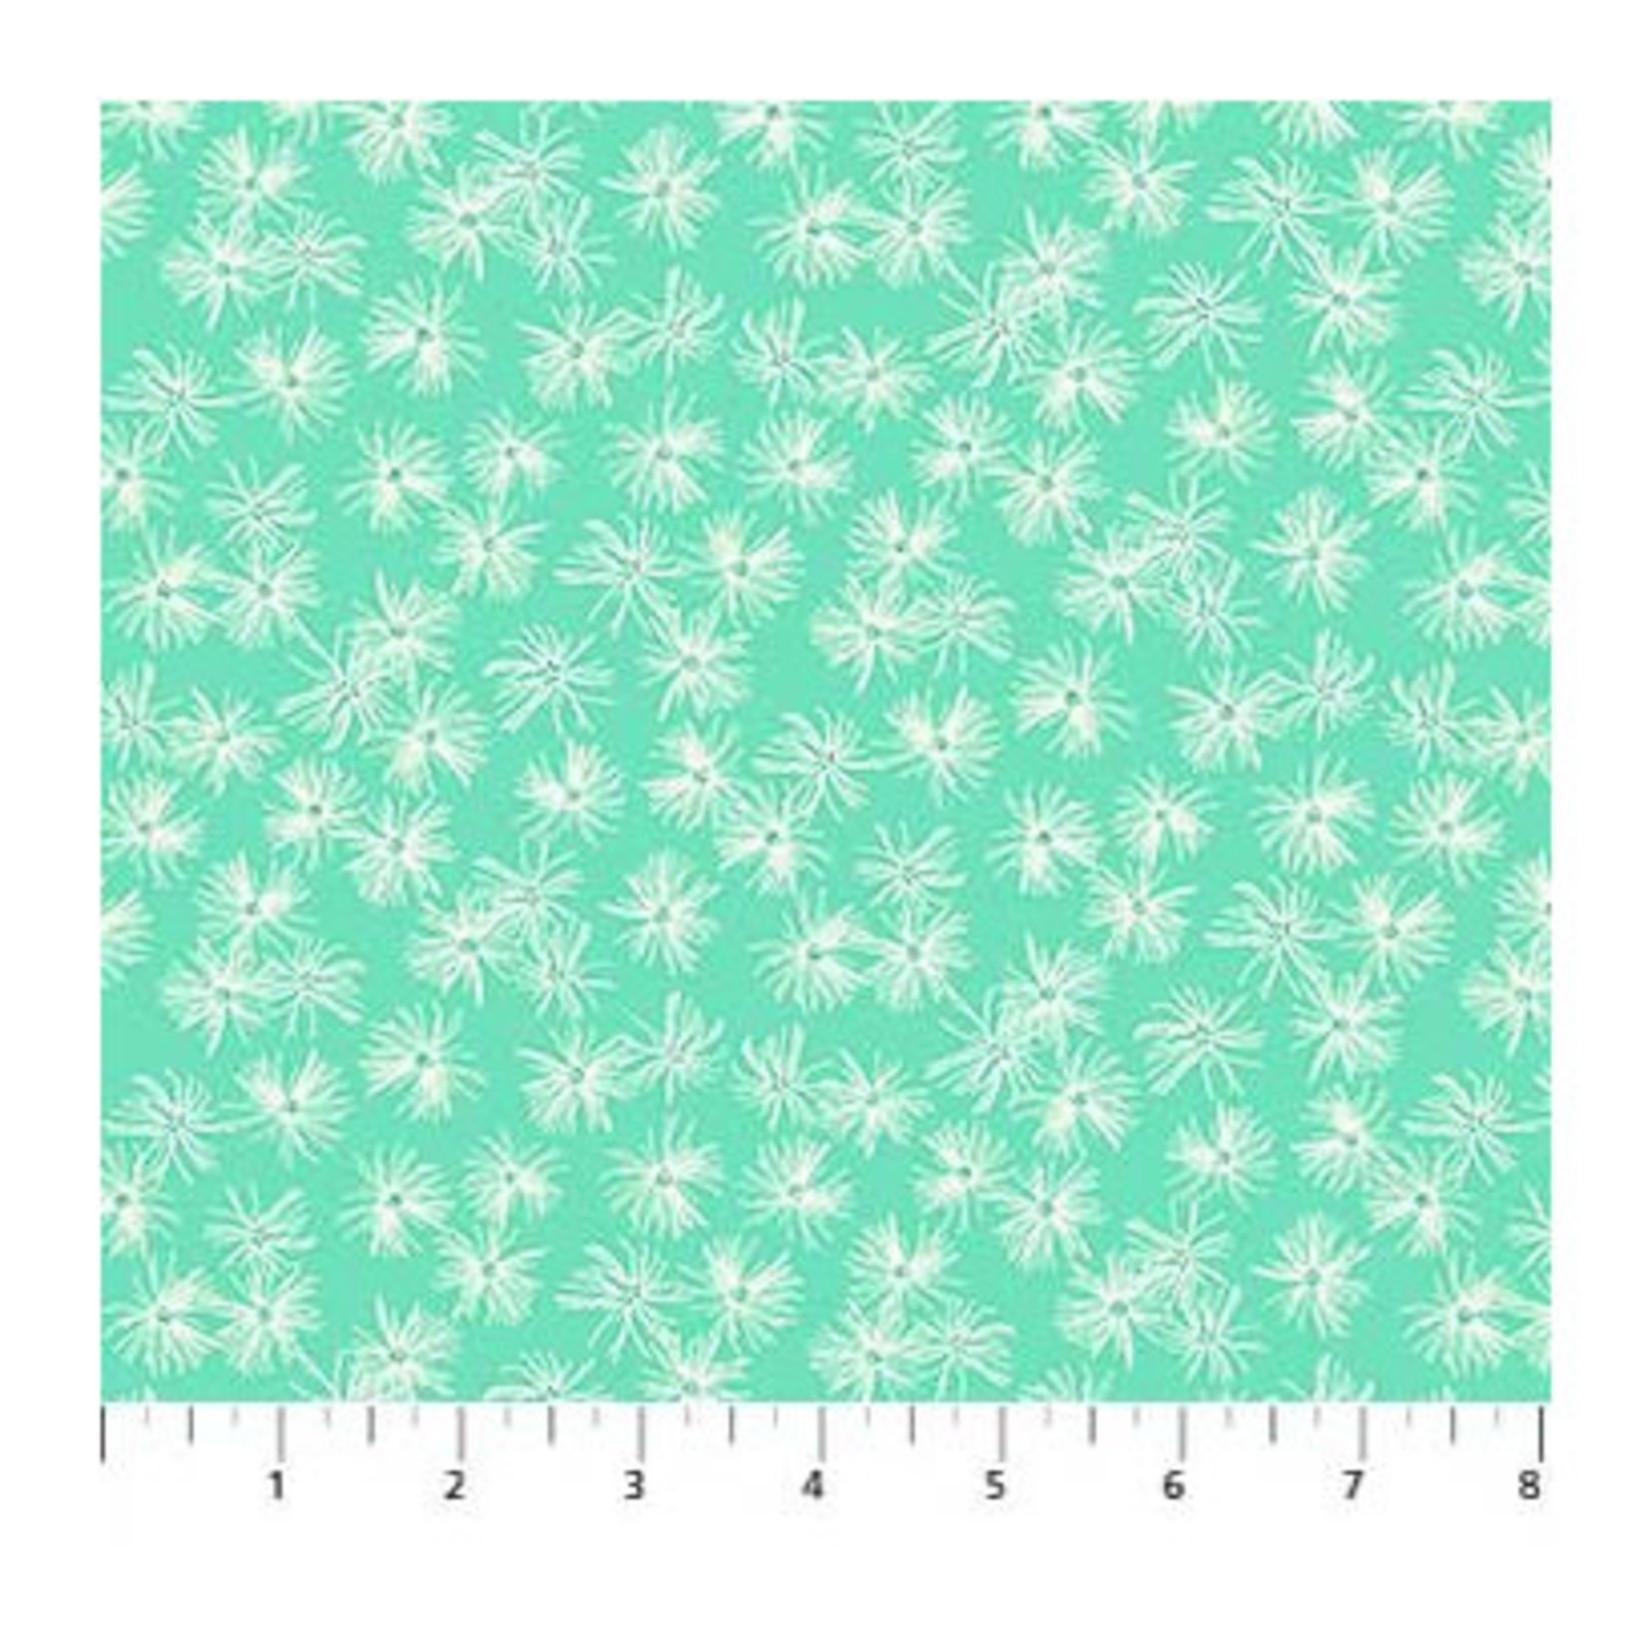 Figo Fabrics Mountain Meadow - Dandelions - Mint